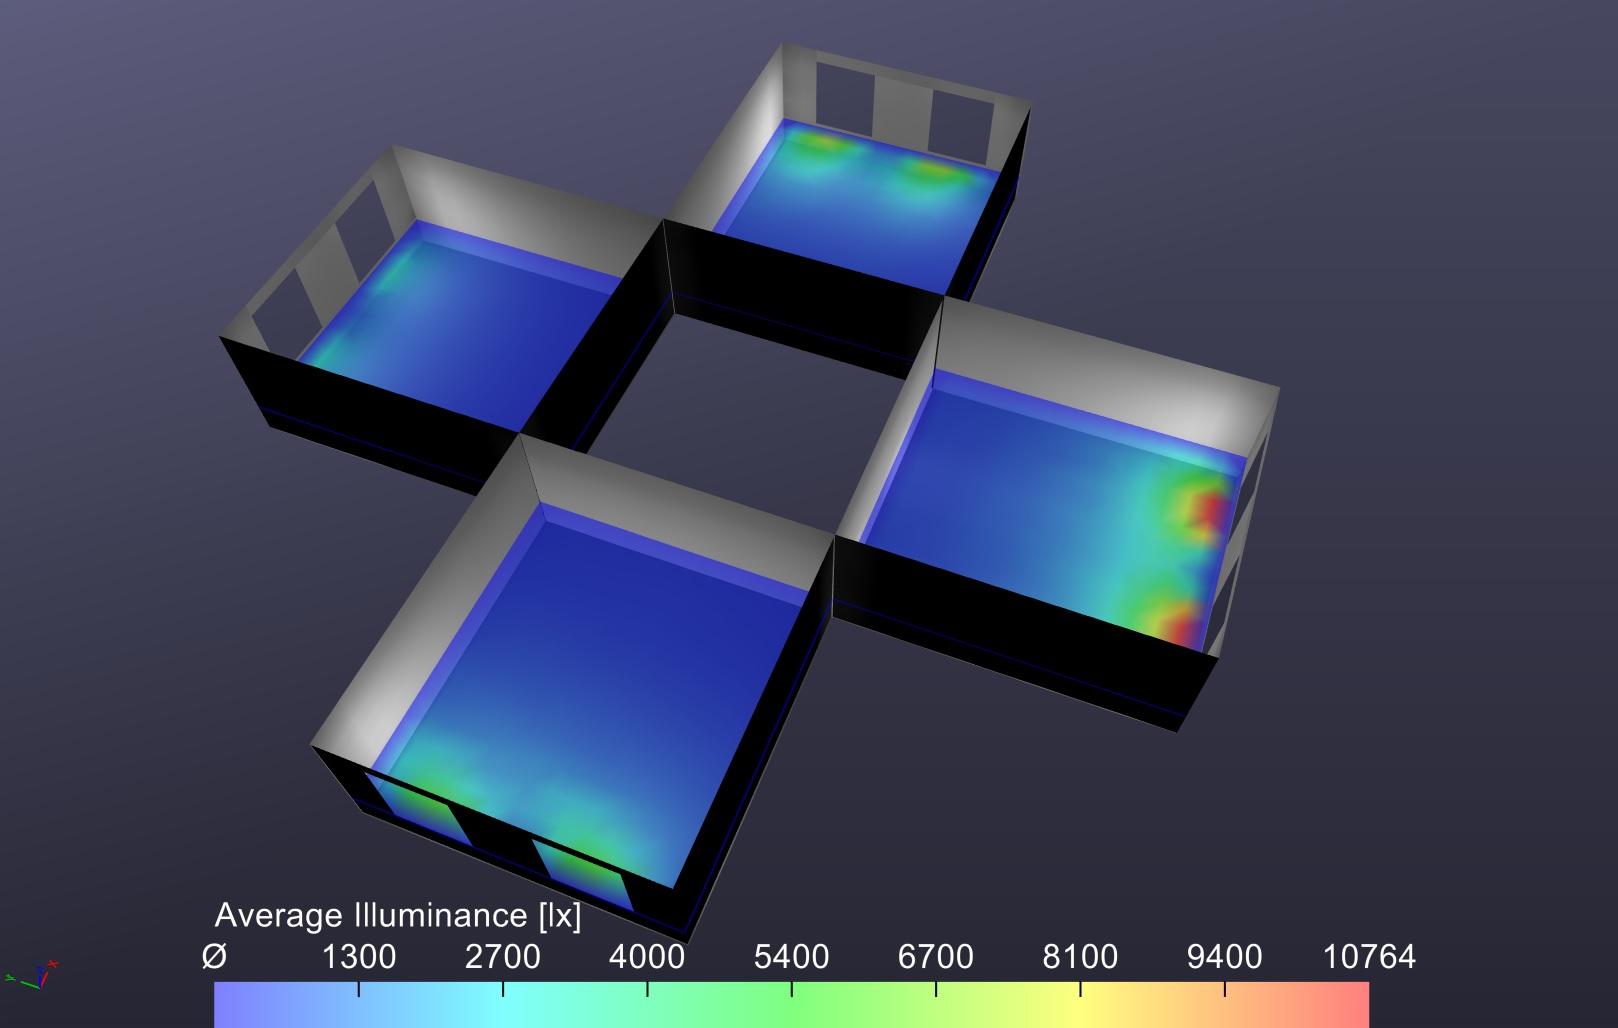 Figure 1 - Benchmark Model